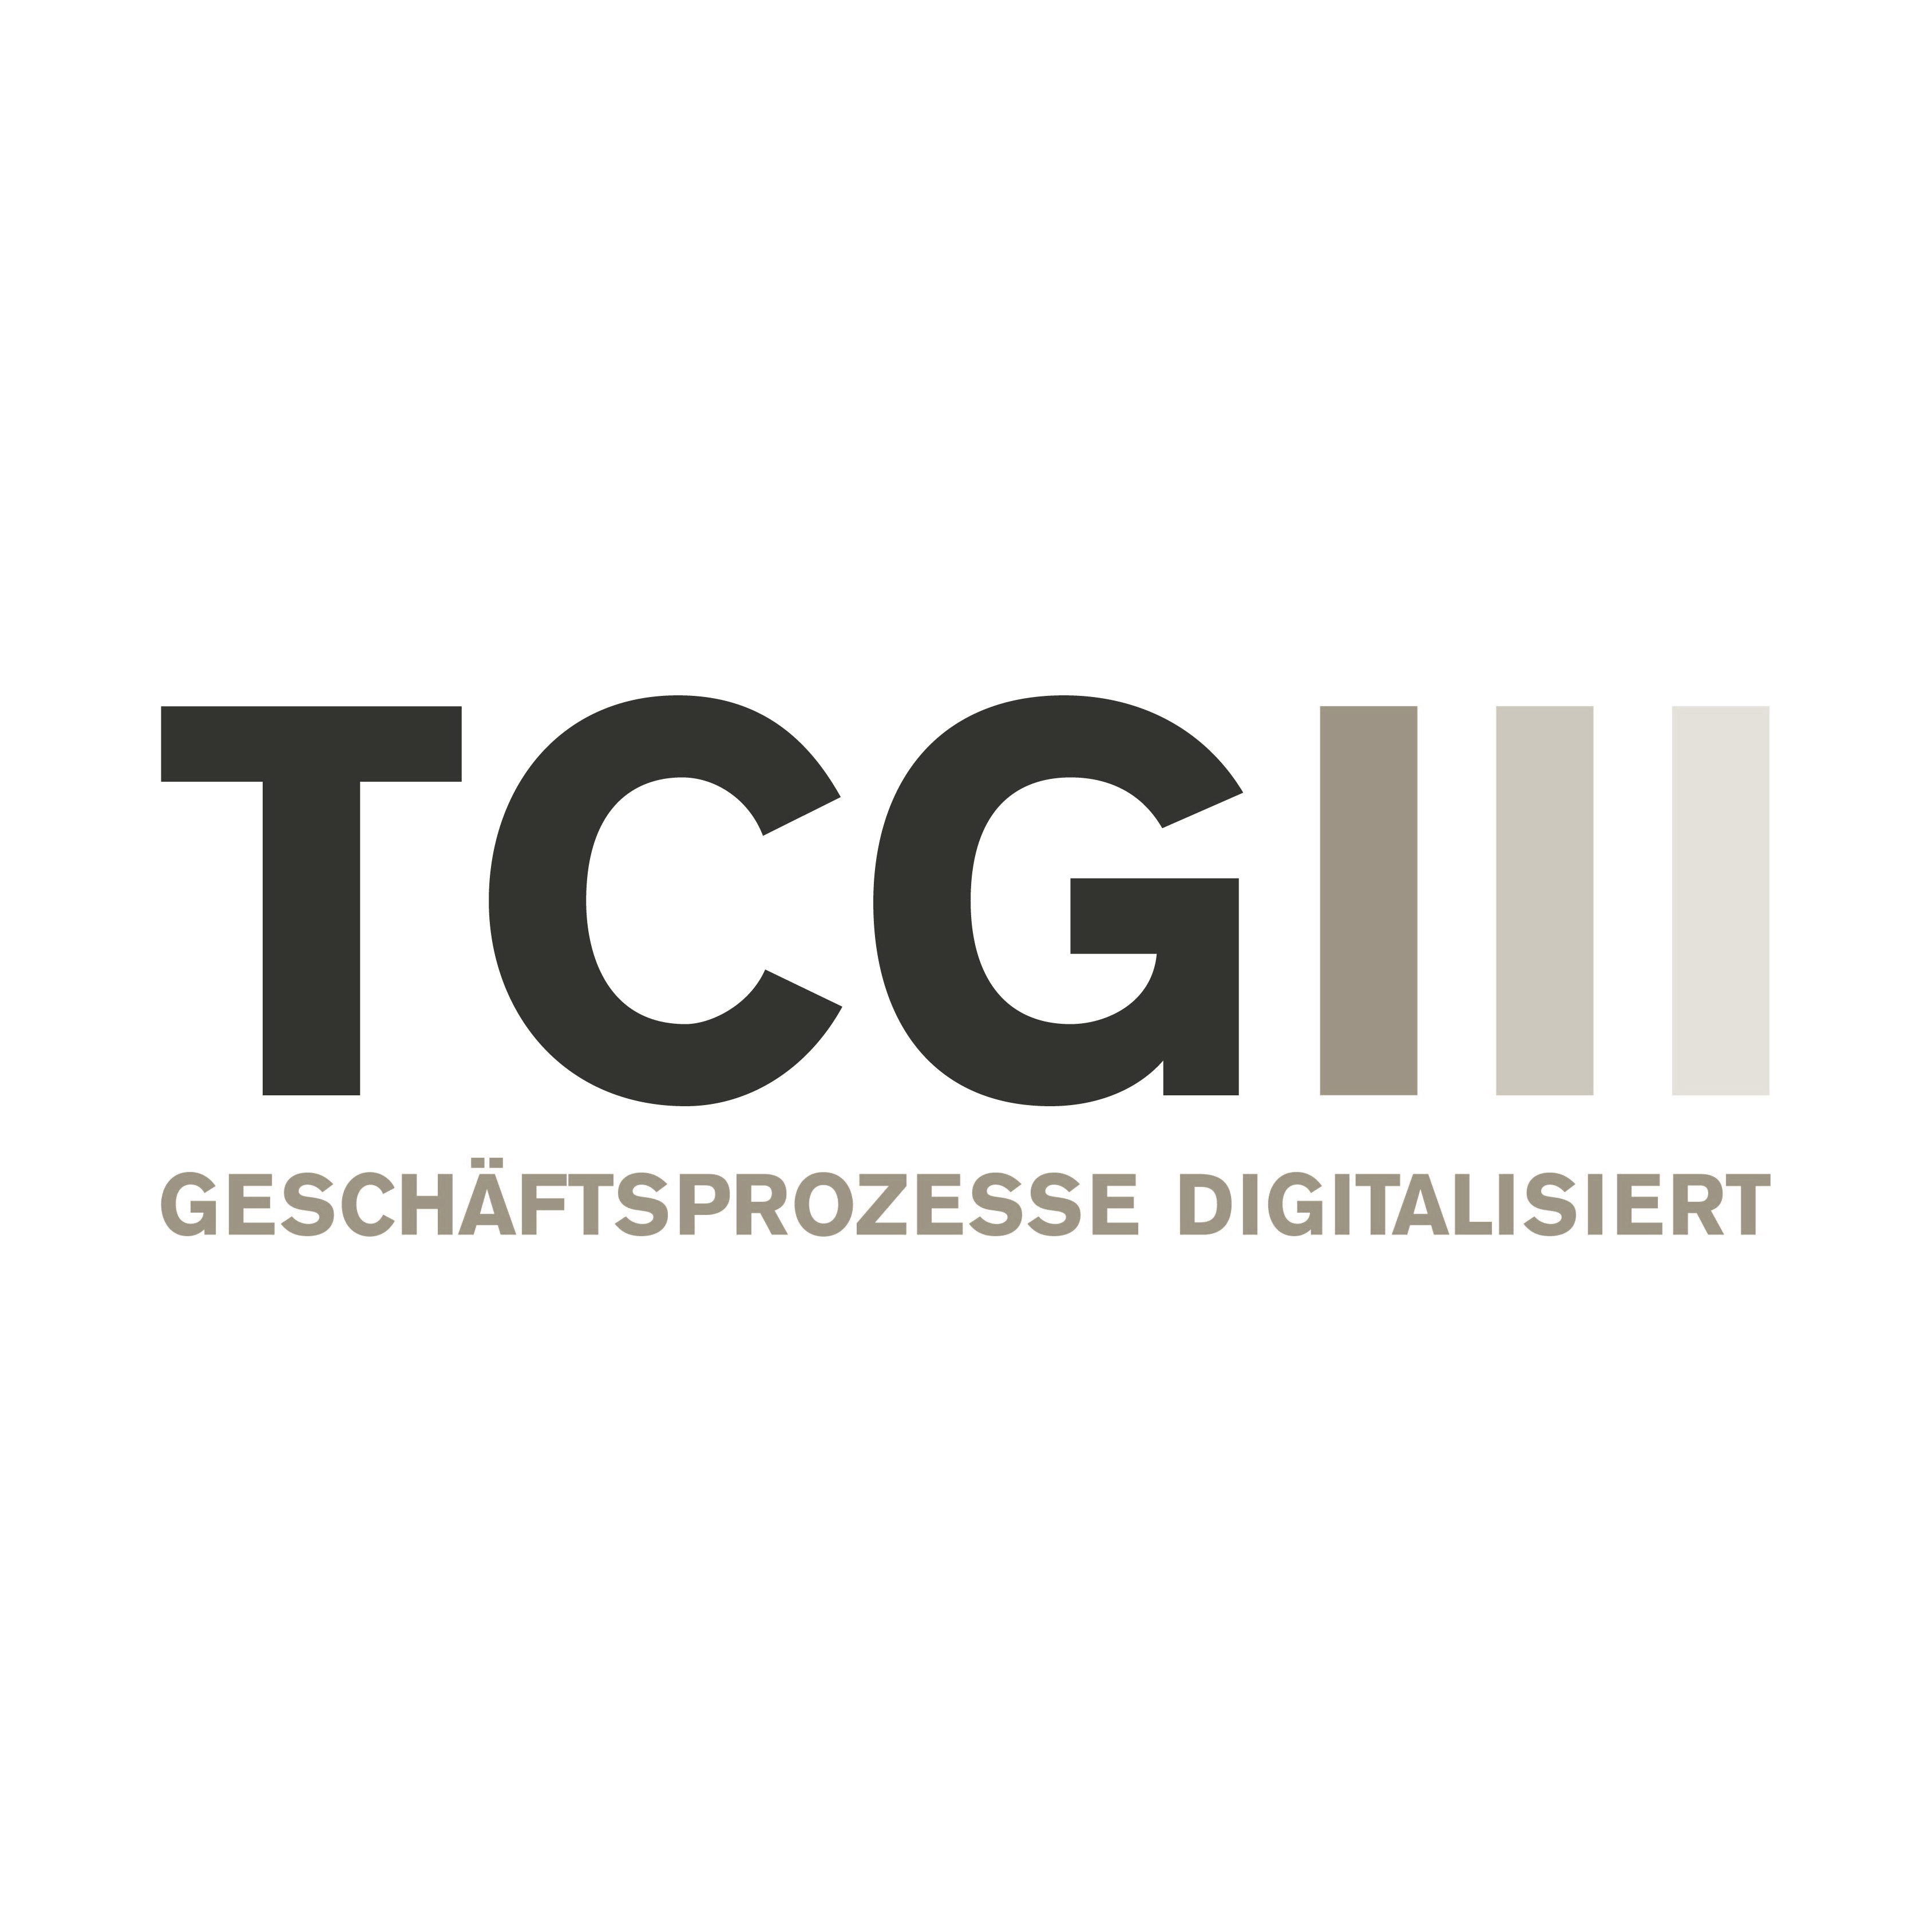 Partner: TCG Process GmbH